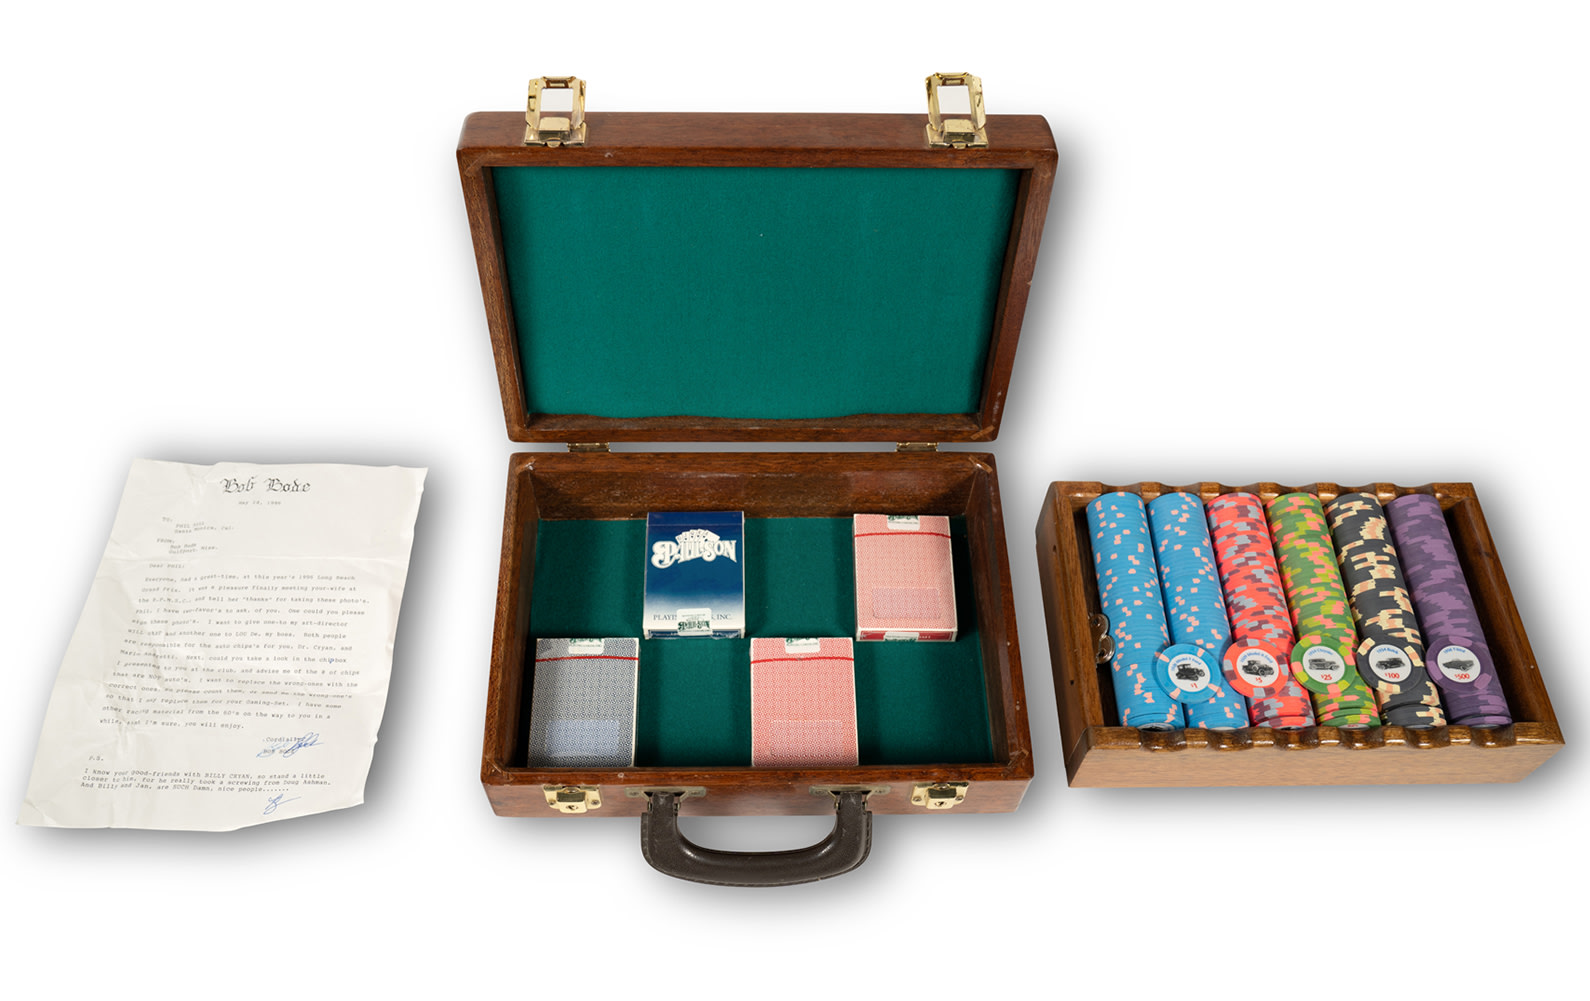 Prod/O21E - Phil Hill C 2021/C0200_Automotive-Themed Poker Chip Set/C0200_Automotive_Poker_Chip_Set_4_vnkga5